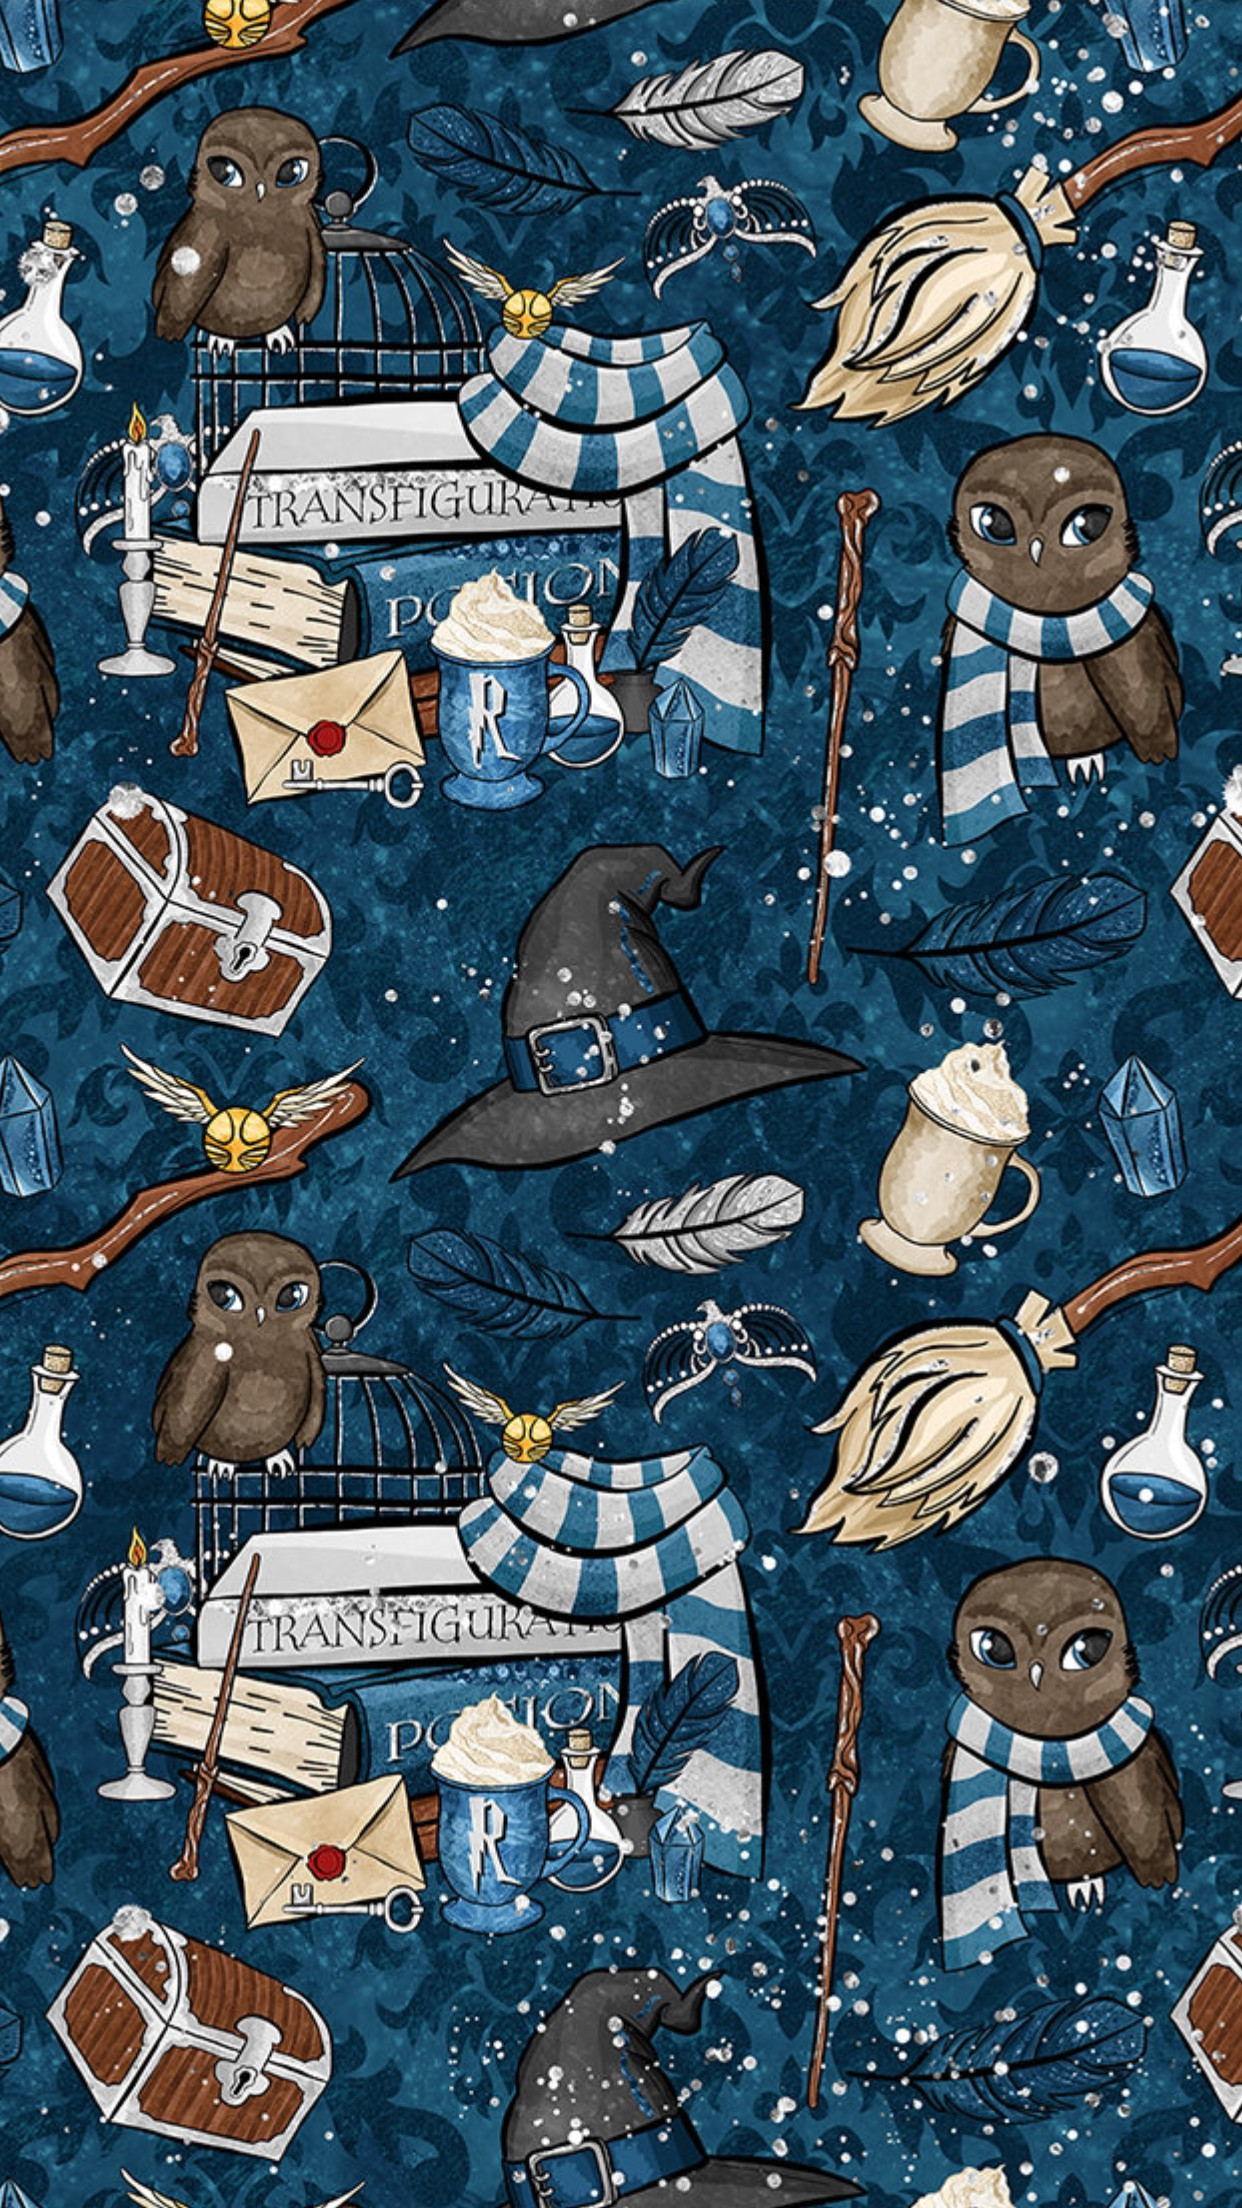 Harry Potter Ravenclaw Wallpaper 72 Images